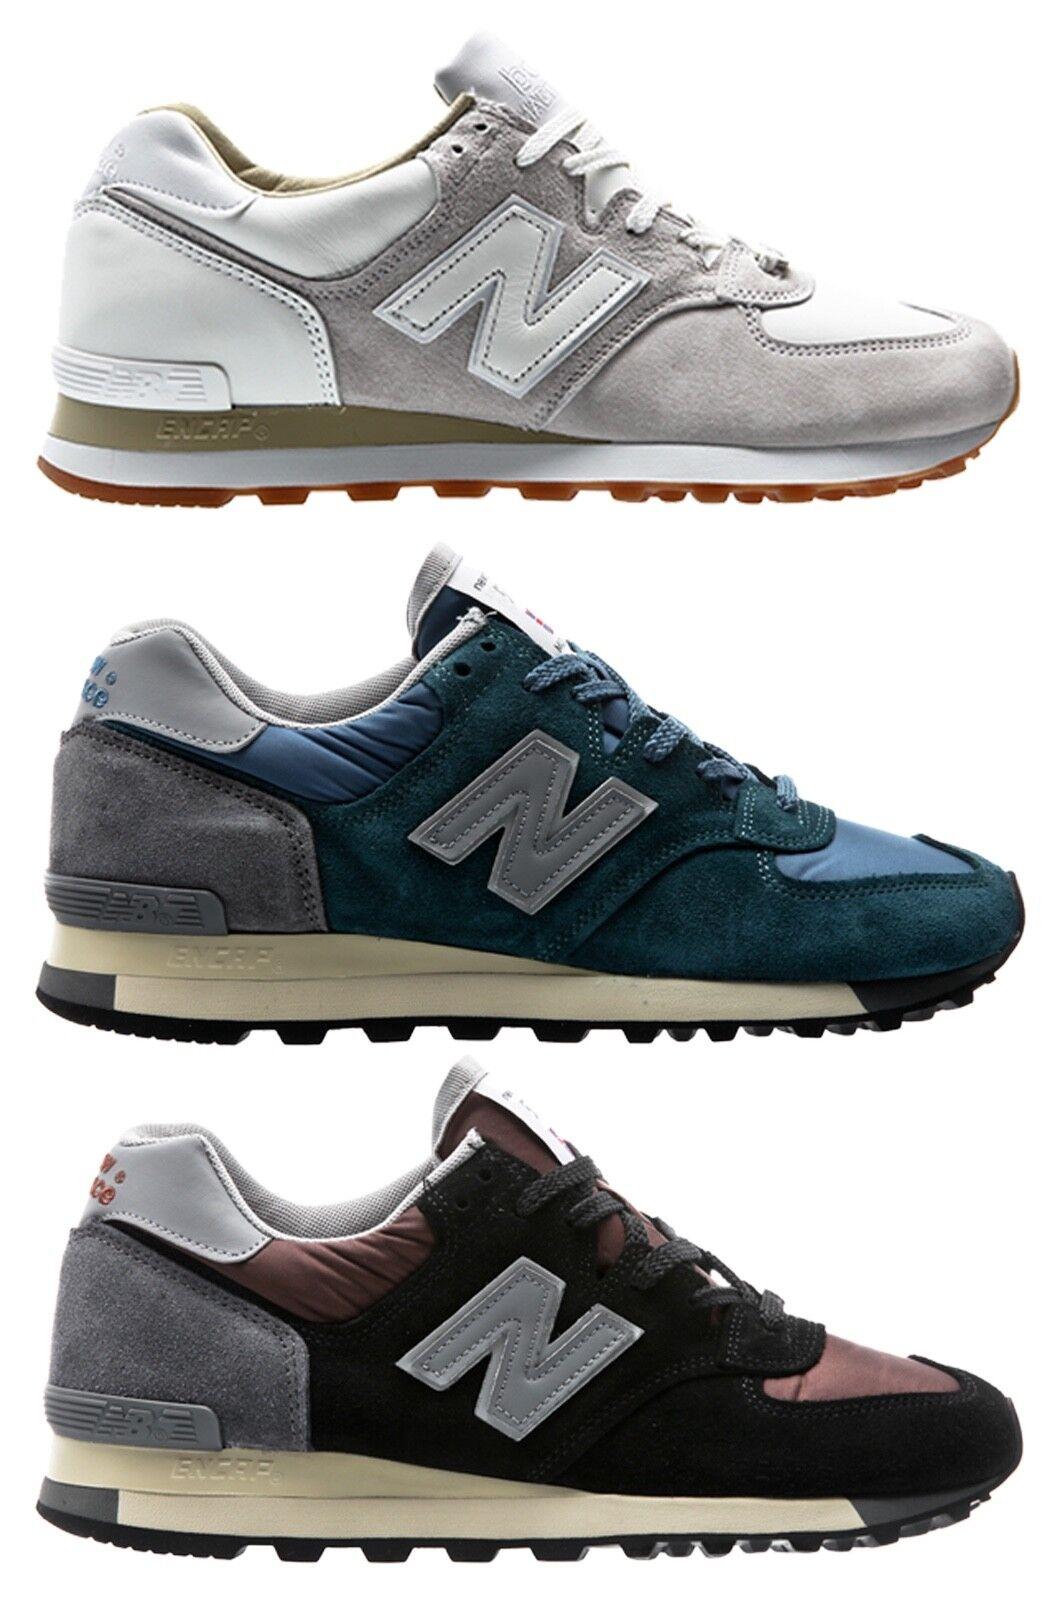 0057cfbace7 New M575 End SNB SNR MEN SNEAKER MEN SHOES Running shoes 575 Balance ...